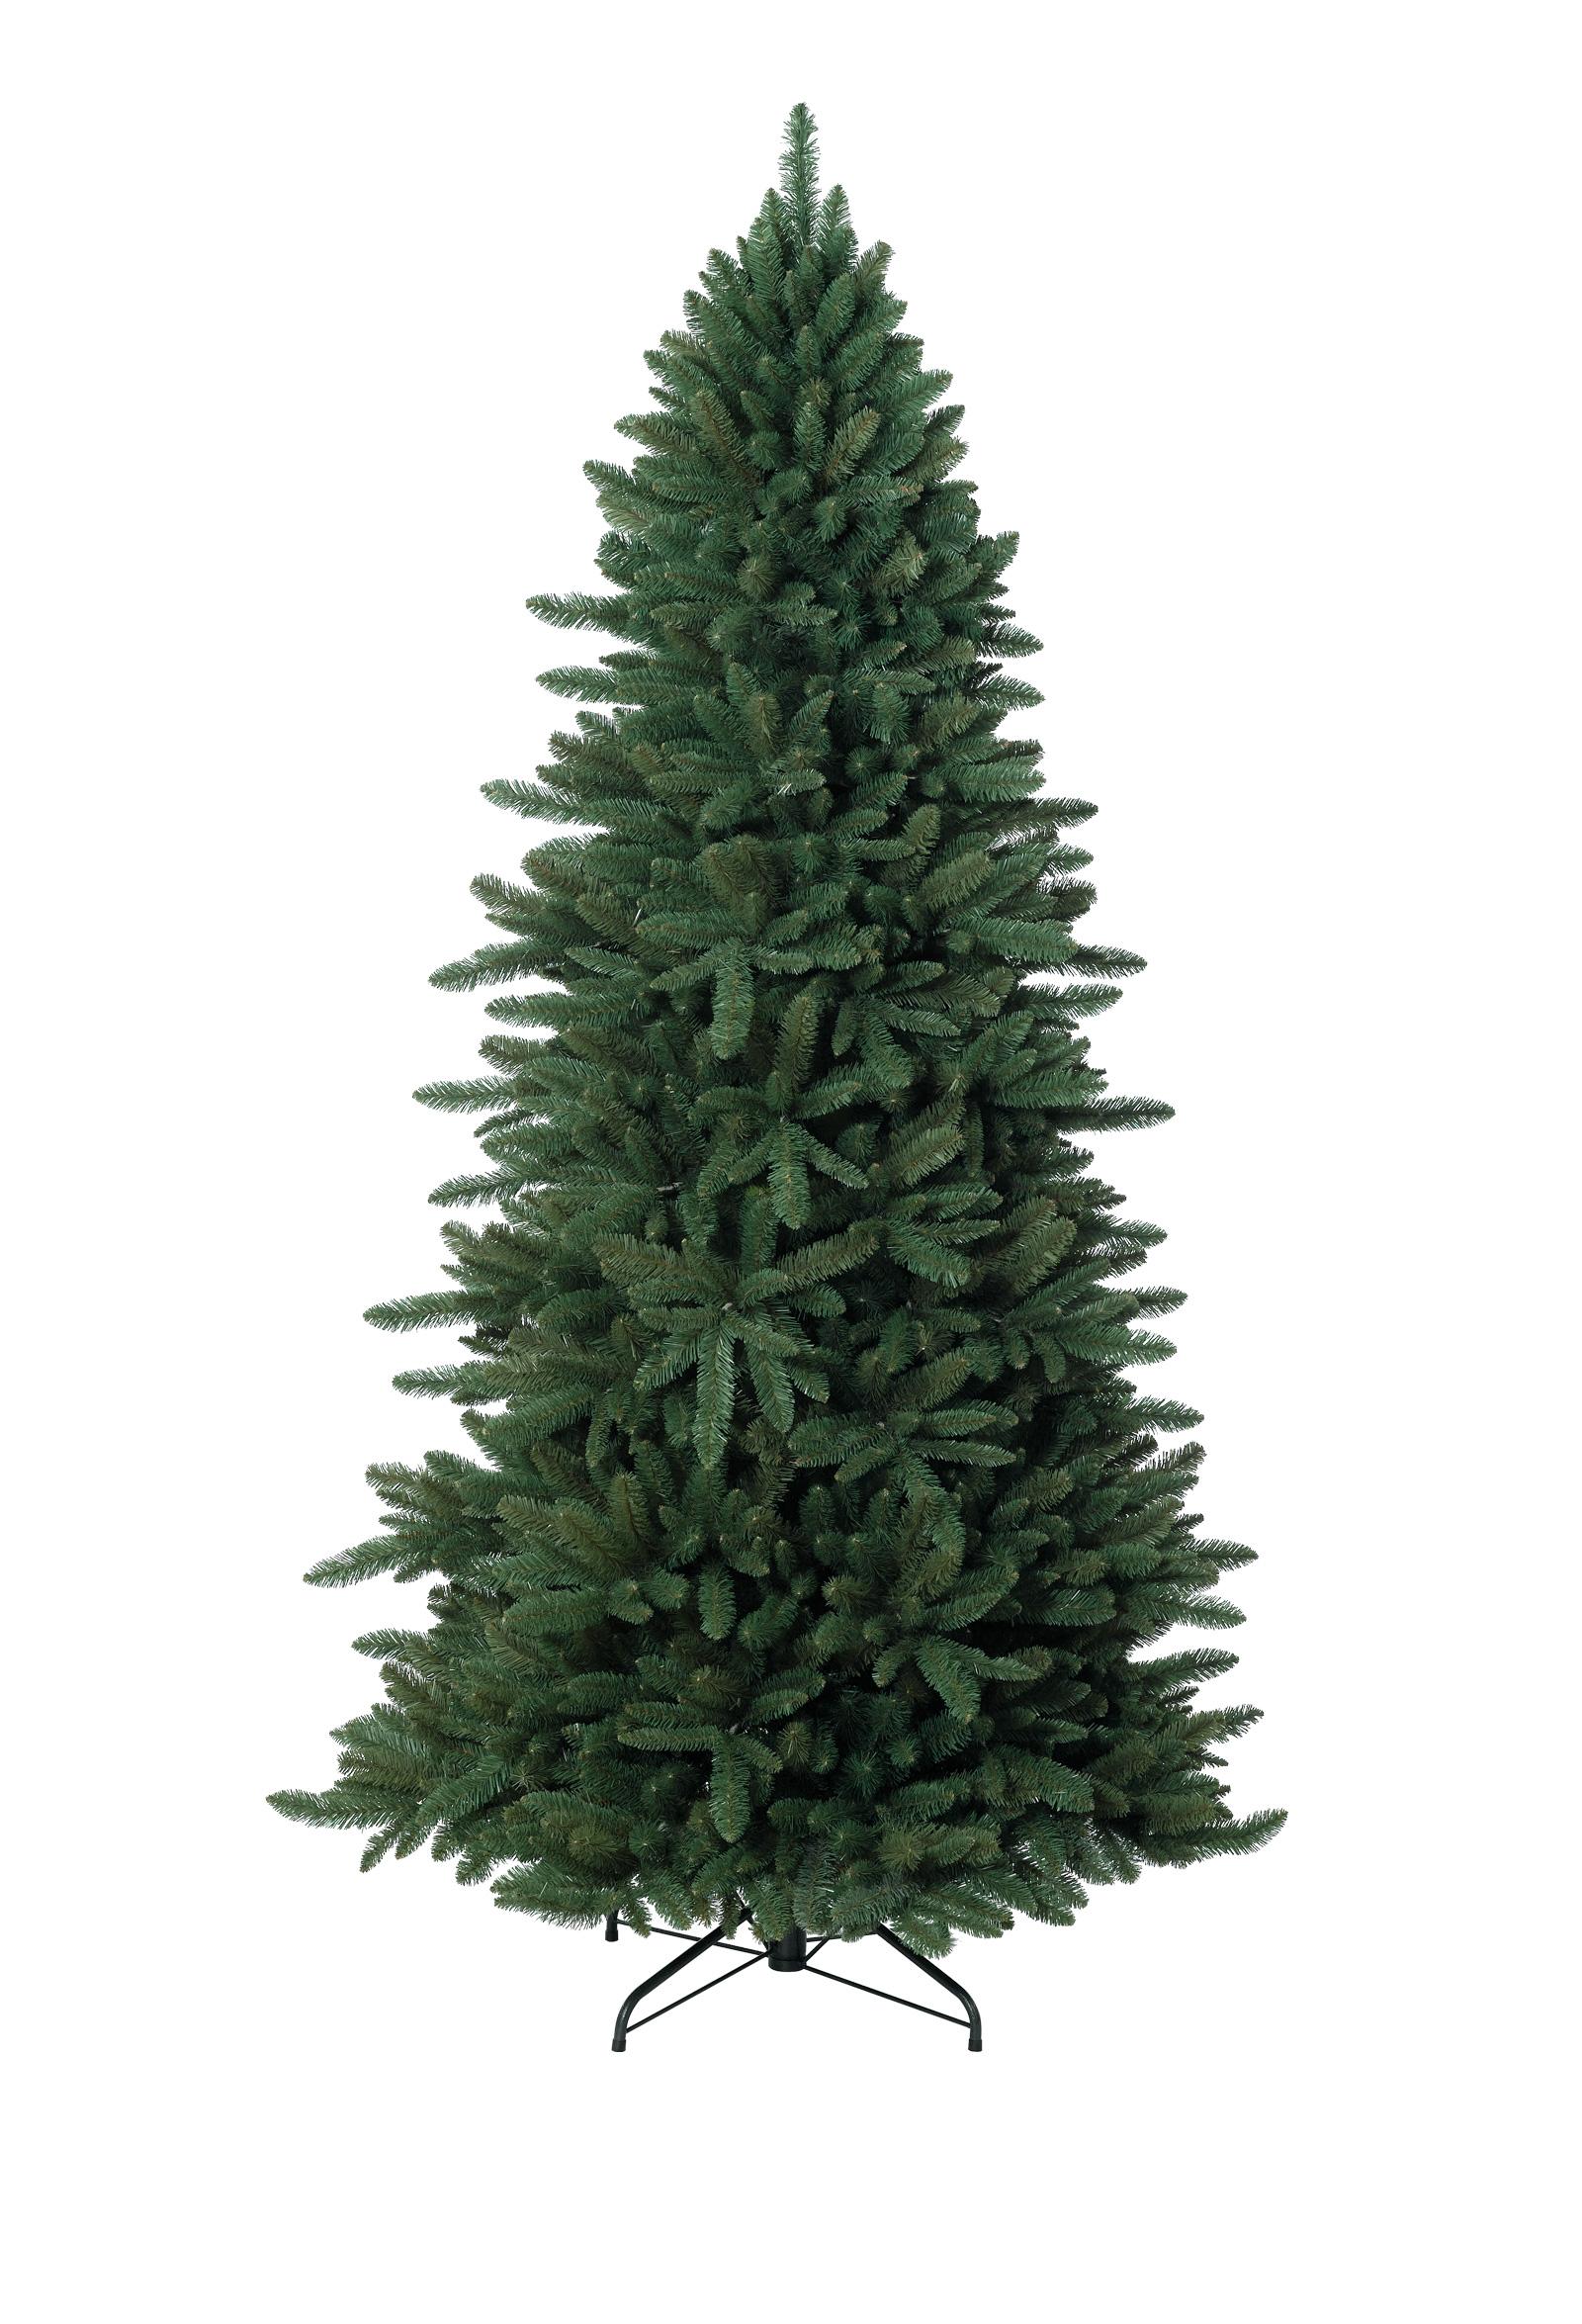 10 ft Sierra Slim Unlit Christmas Tree | Christmas Tree Market